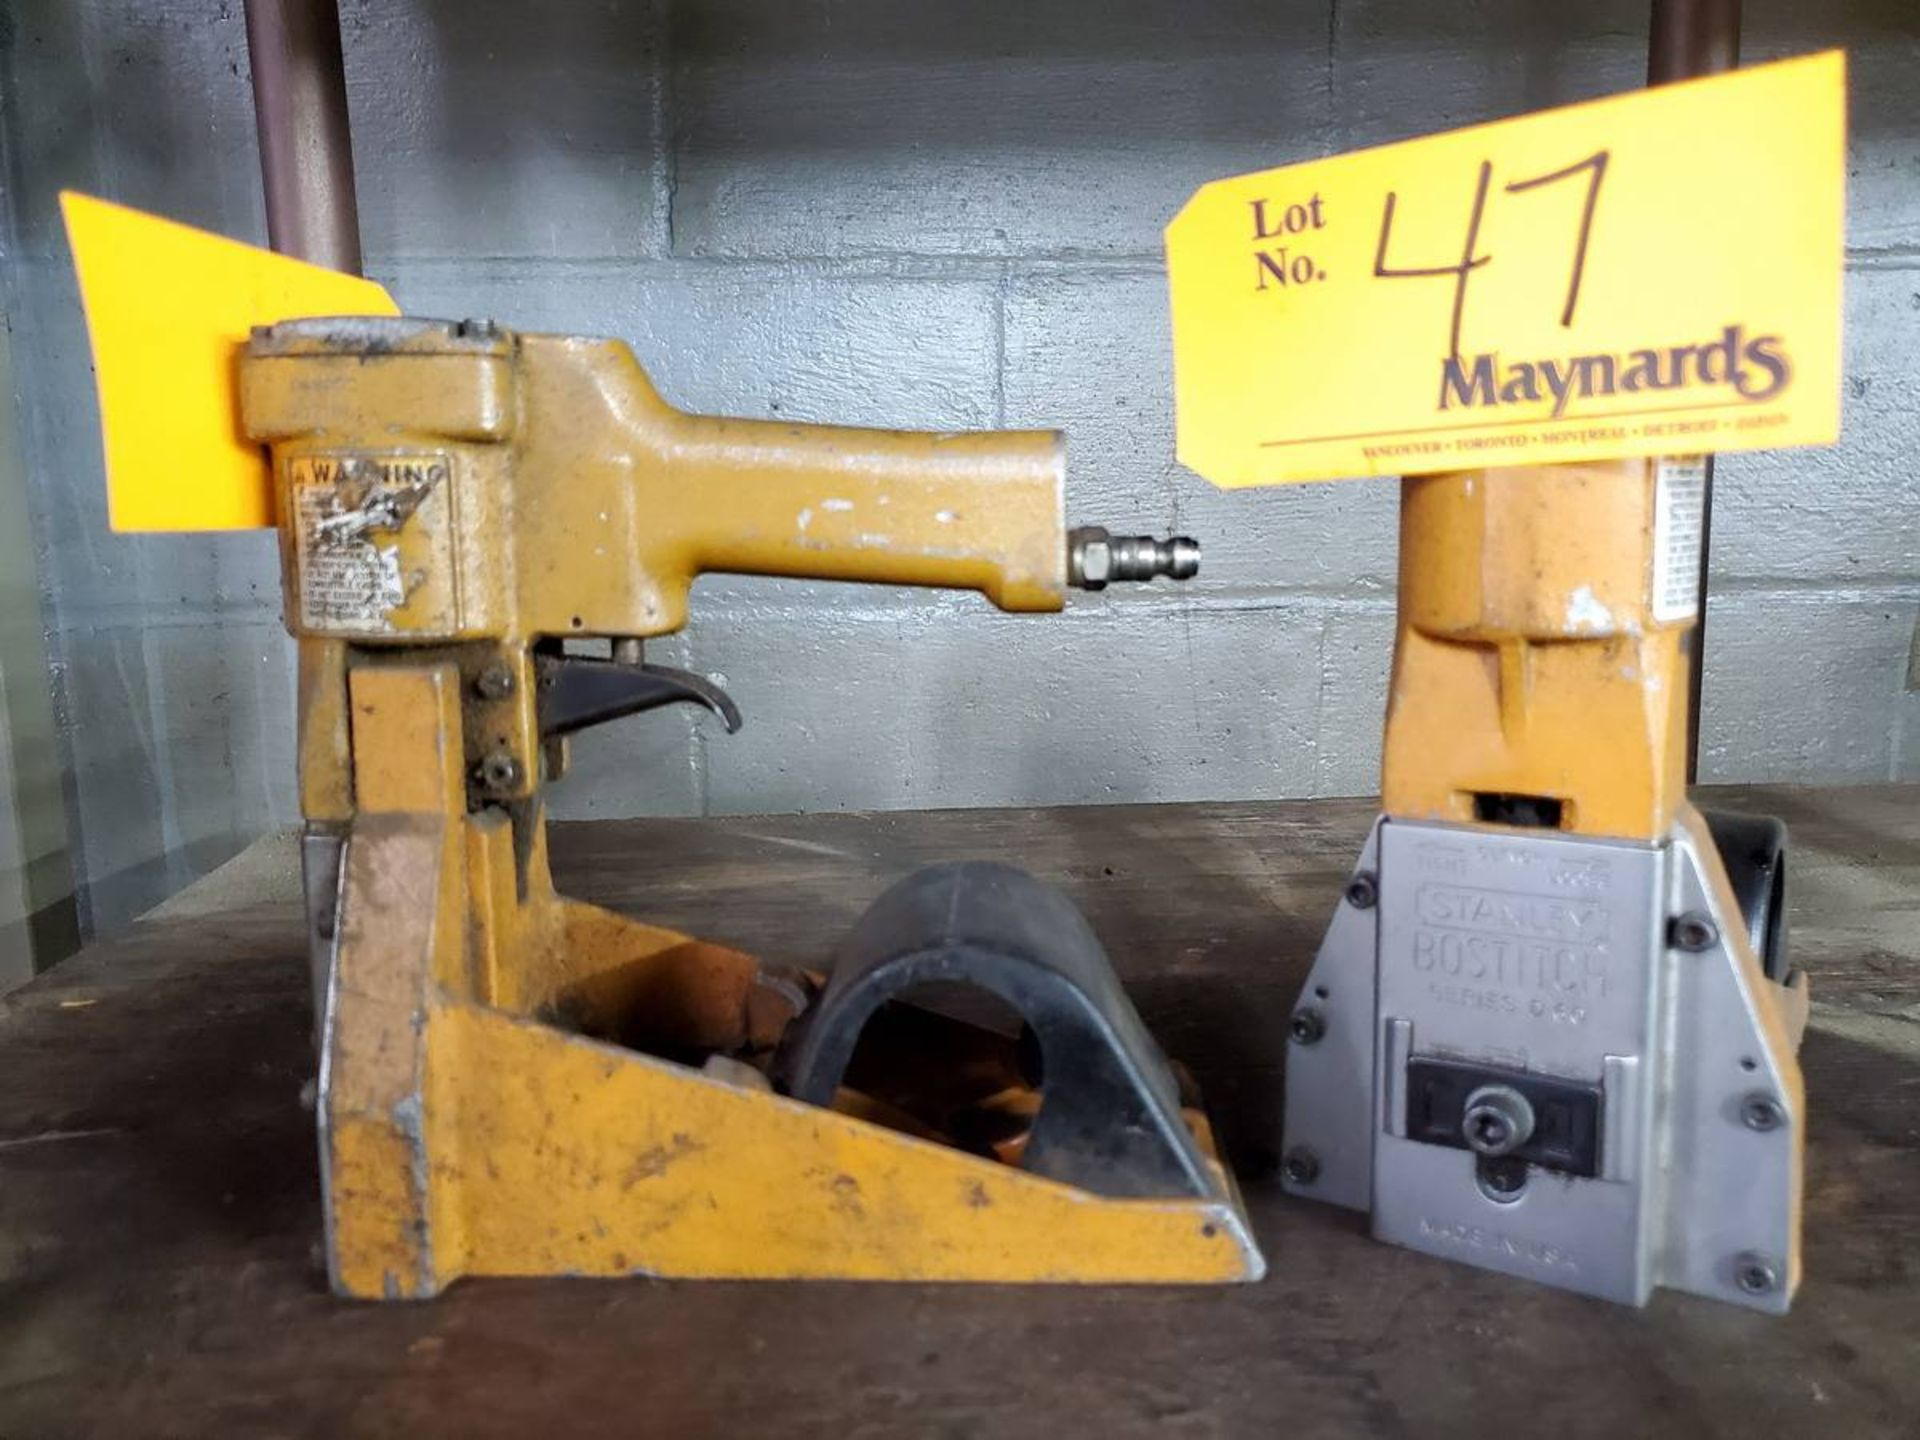 Lot 47 - Bostich Series 60 Industrial Stapler